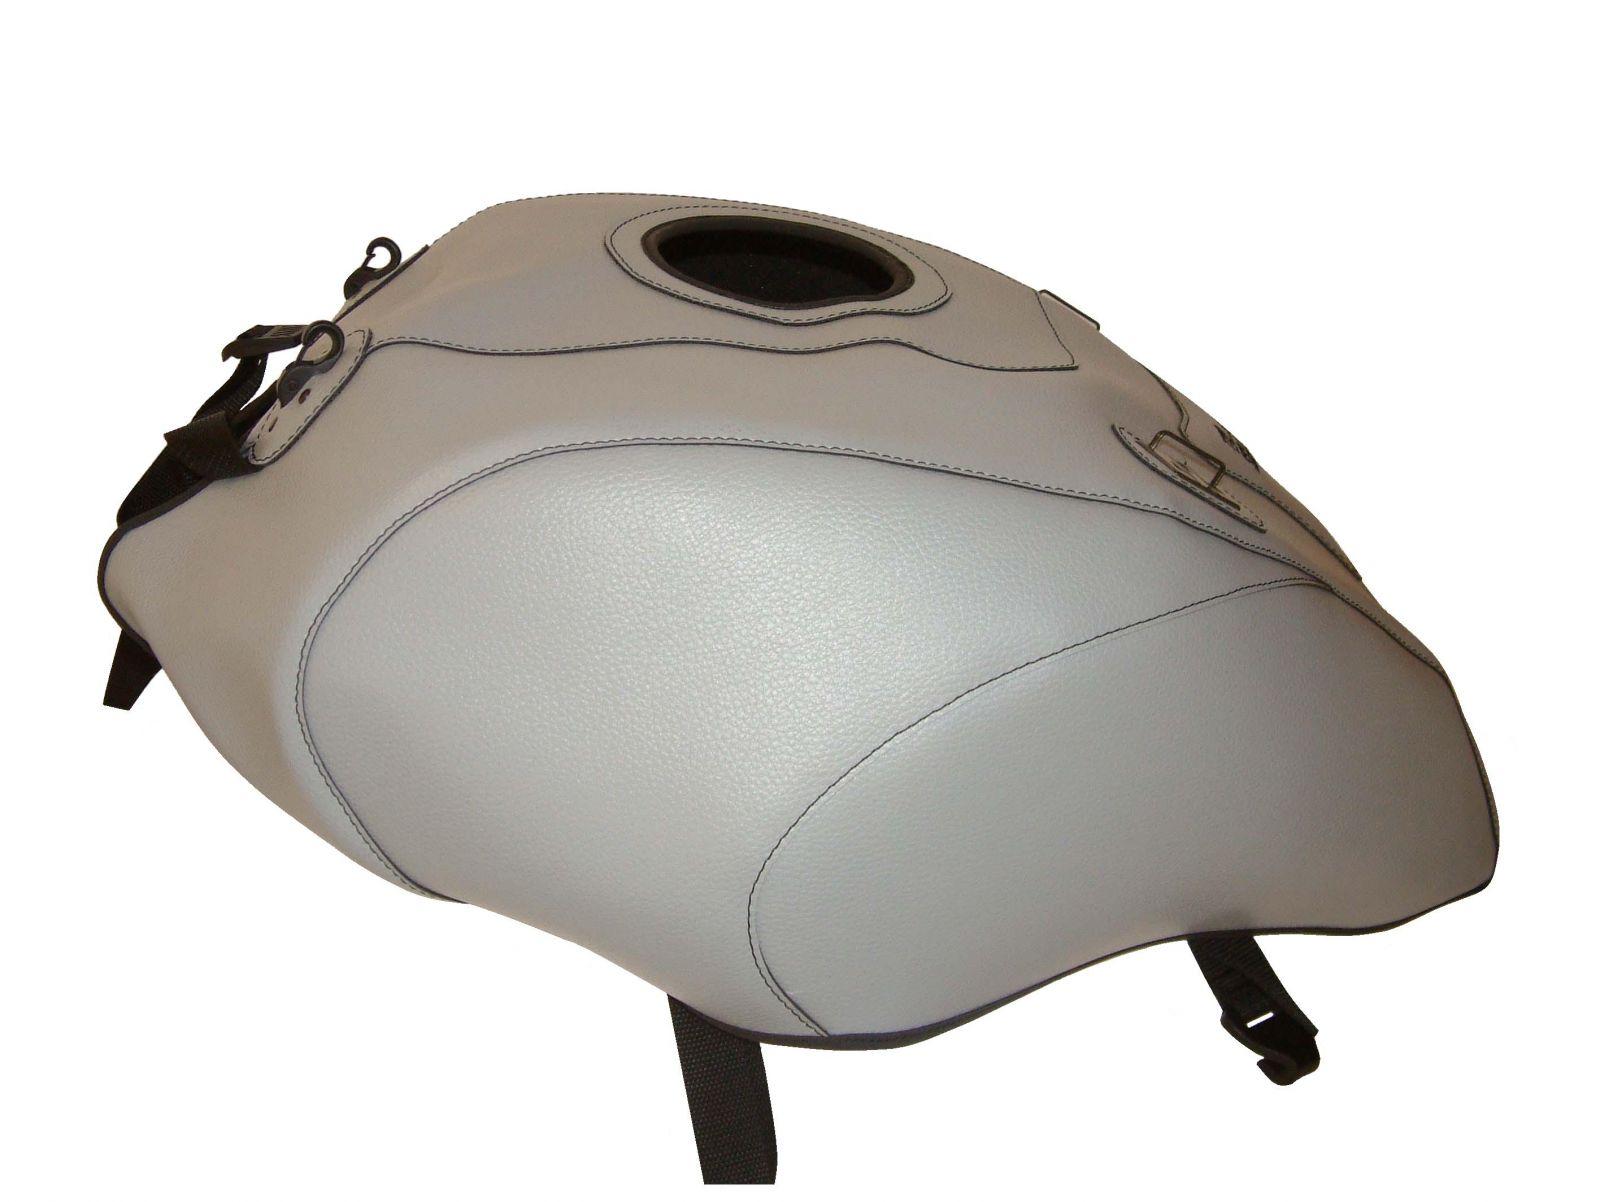 Petrol tank cover TPR5915 - SUZUKI GSX 1400 [2001-2008]